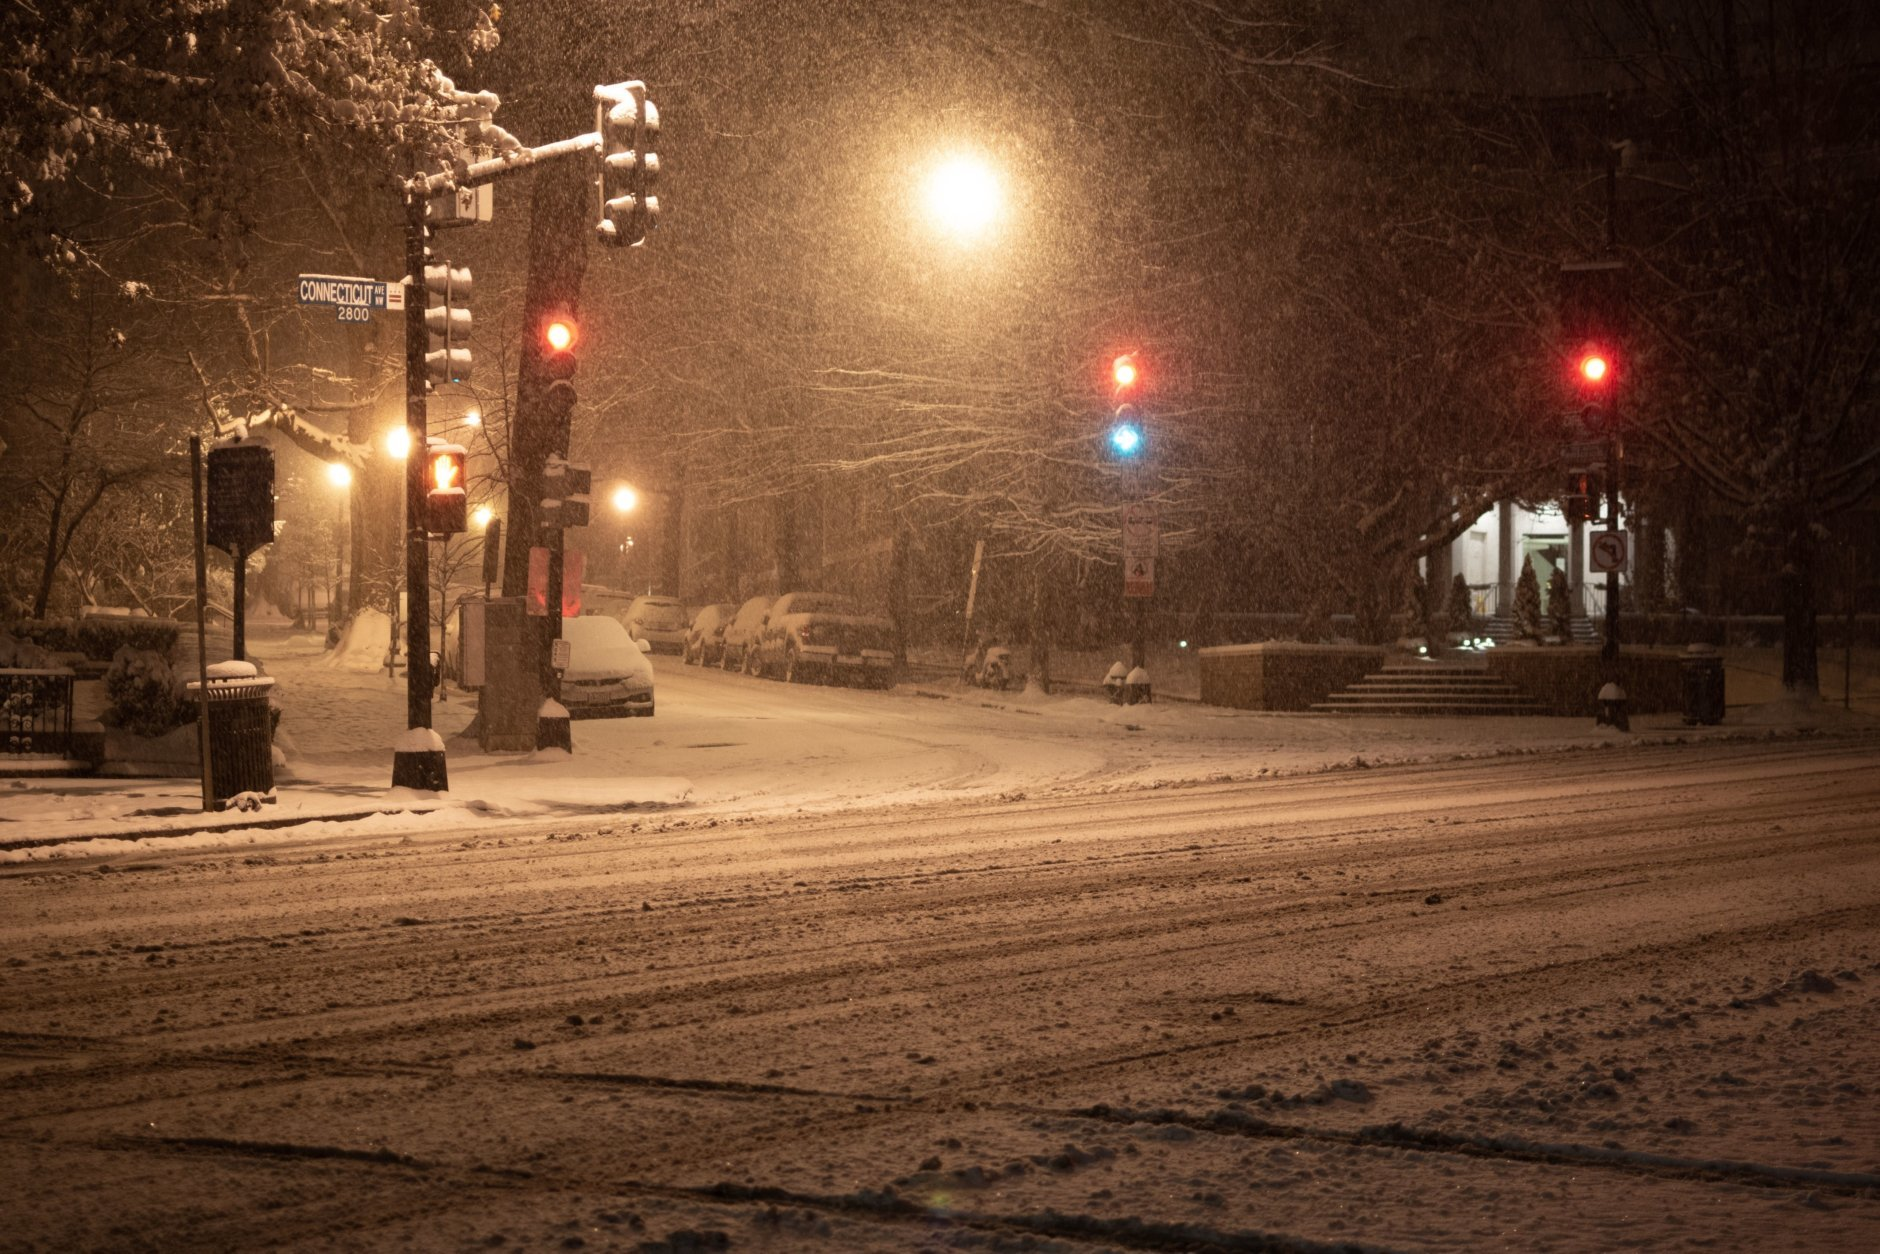 Connecticut Avenue in Woodley Park, northwest D.C. around 4 a.m. Sunday. (WTOP/Alejandro Alvarez)